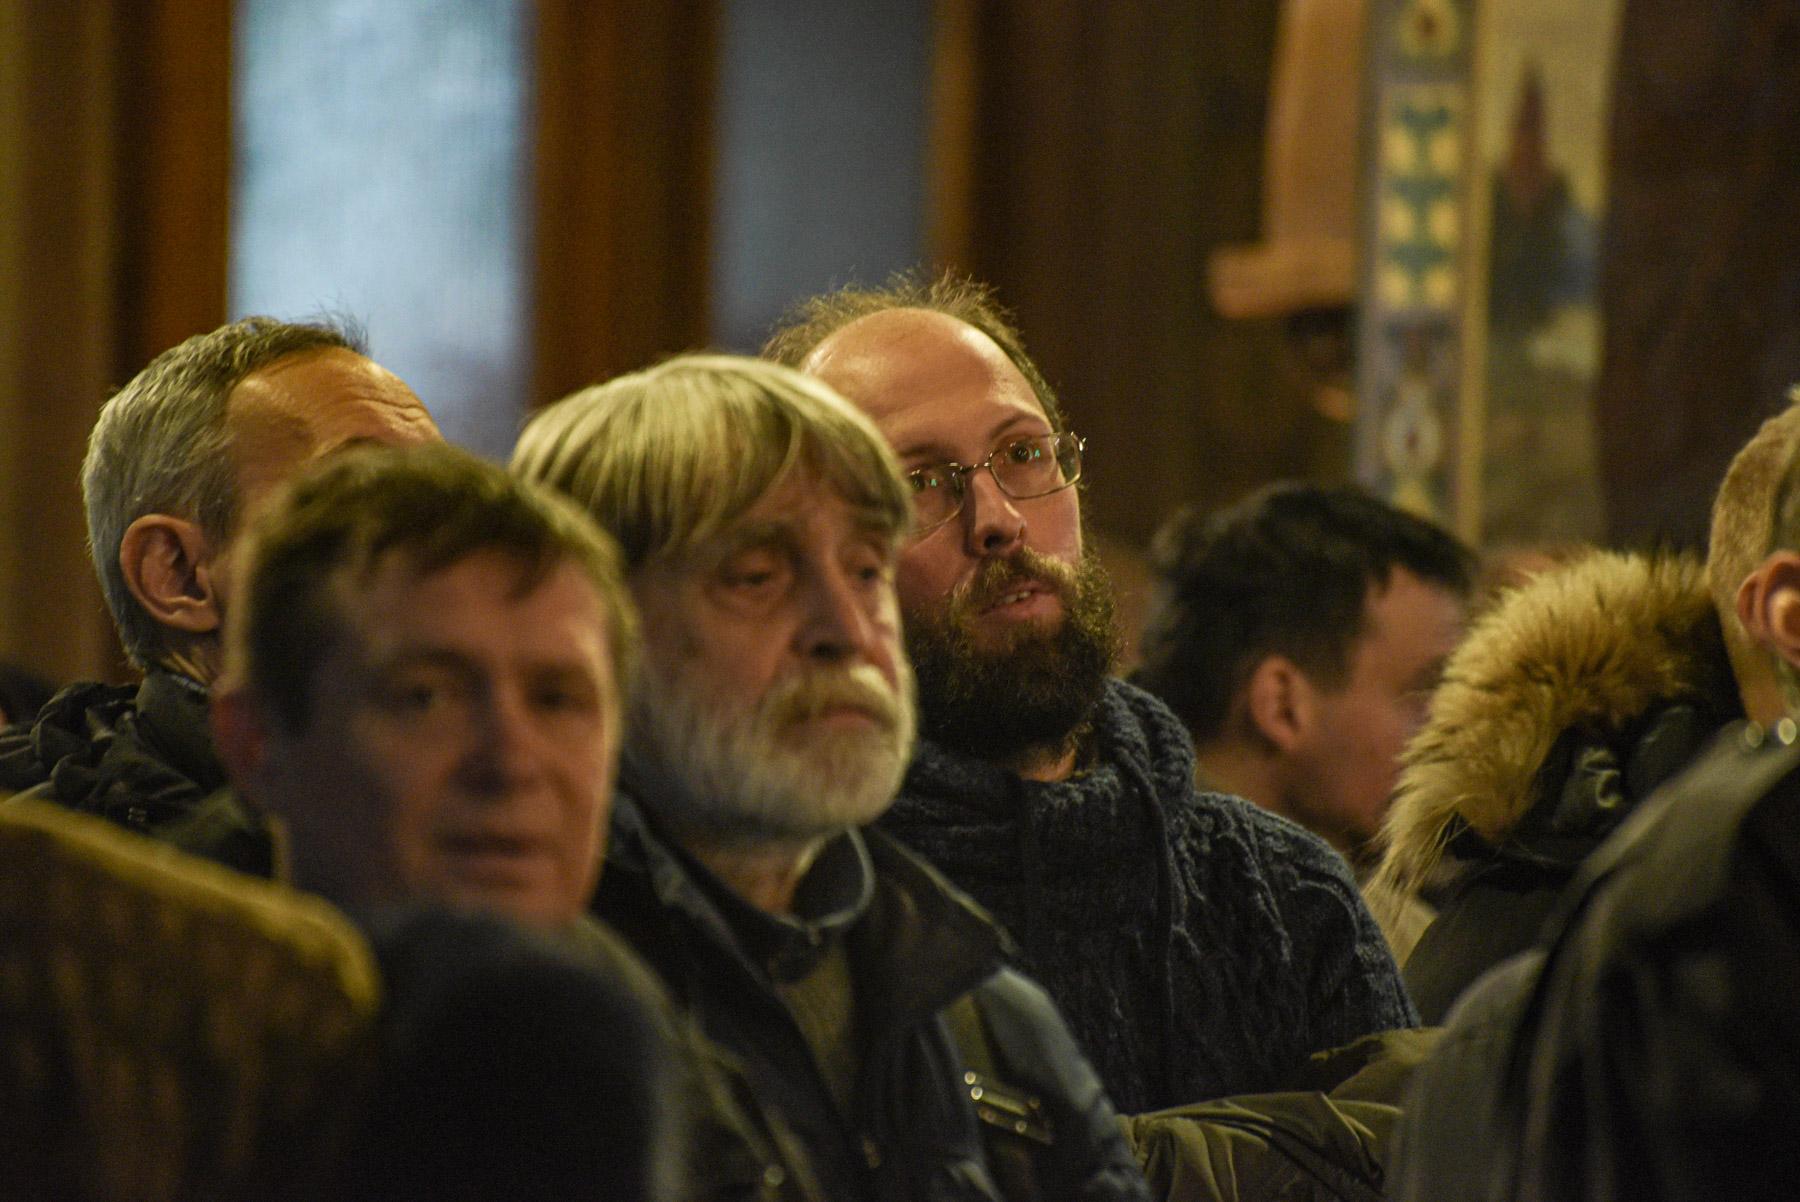 photos of orthodox christmas 0237 2